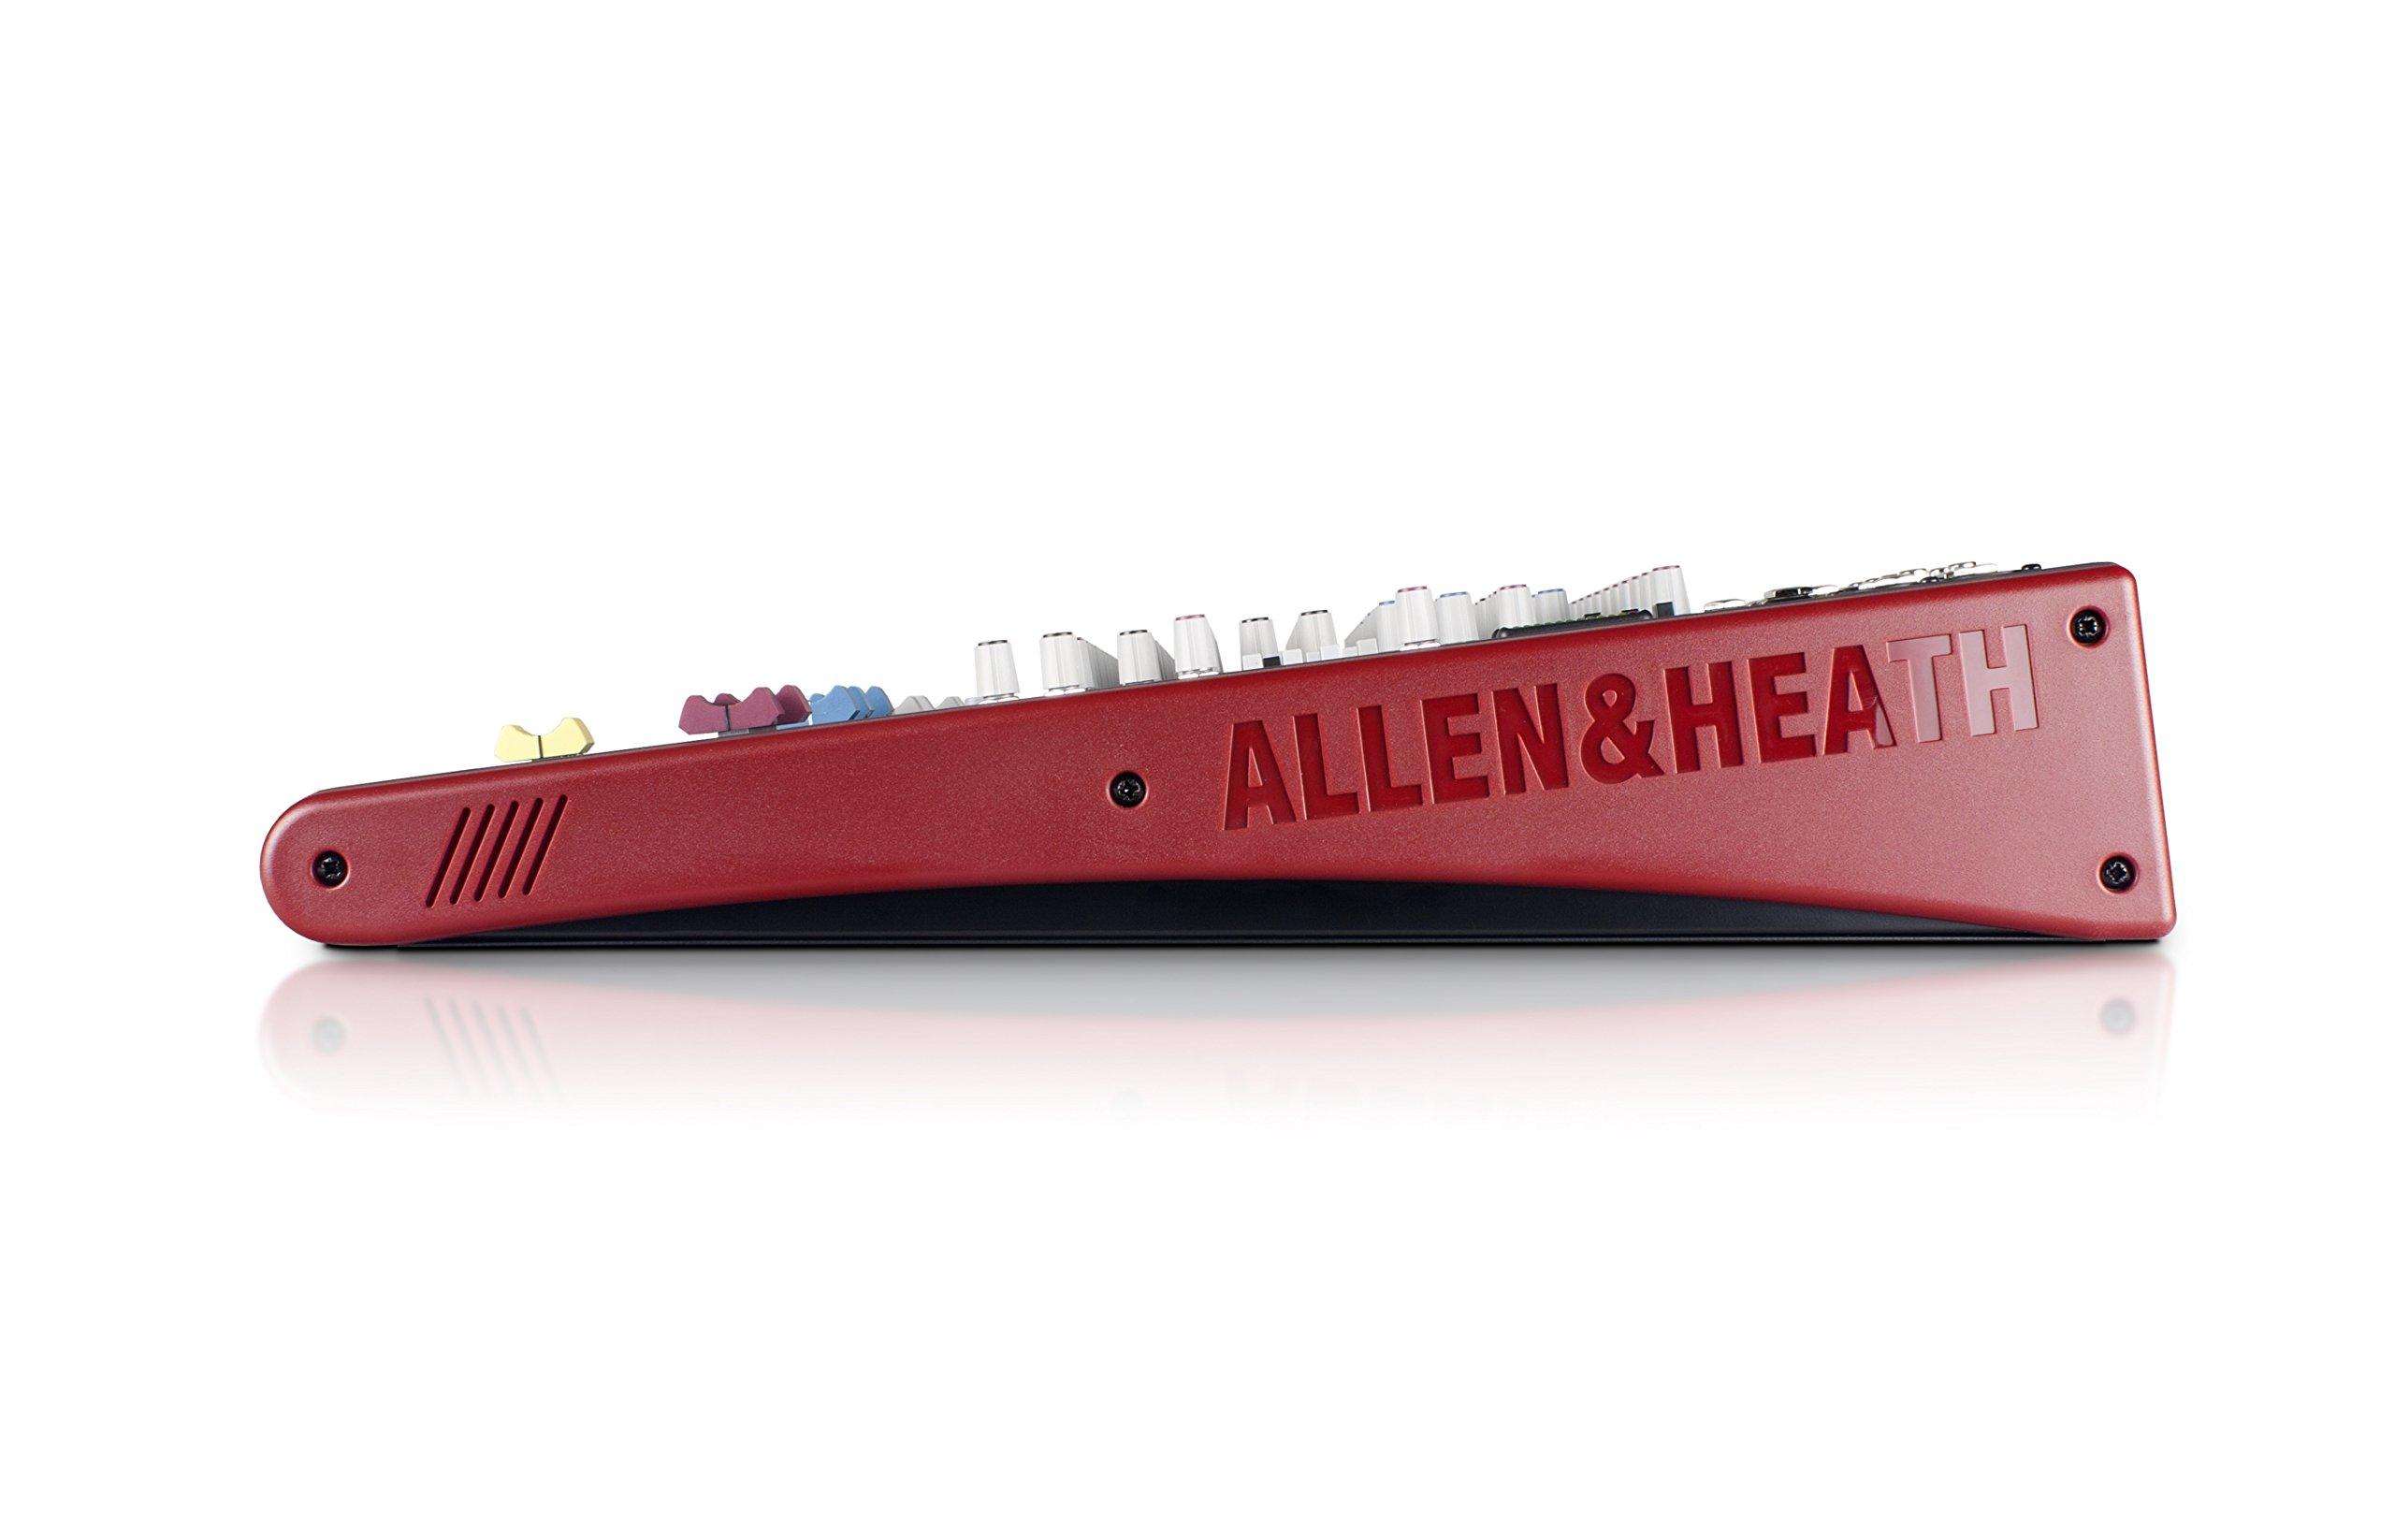 Allen & Heath ZED-16FX 16-Channel Multi-Purpose USB Mixer with FX for Live Sound and Recording by Allen & Heath (Image #5)